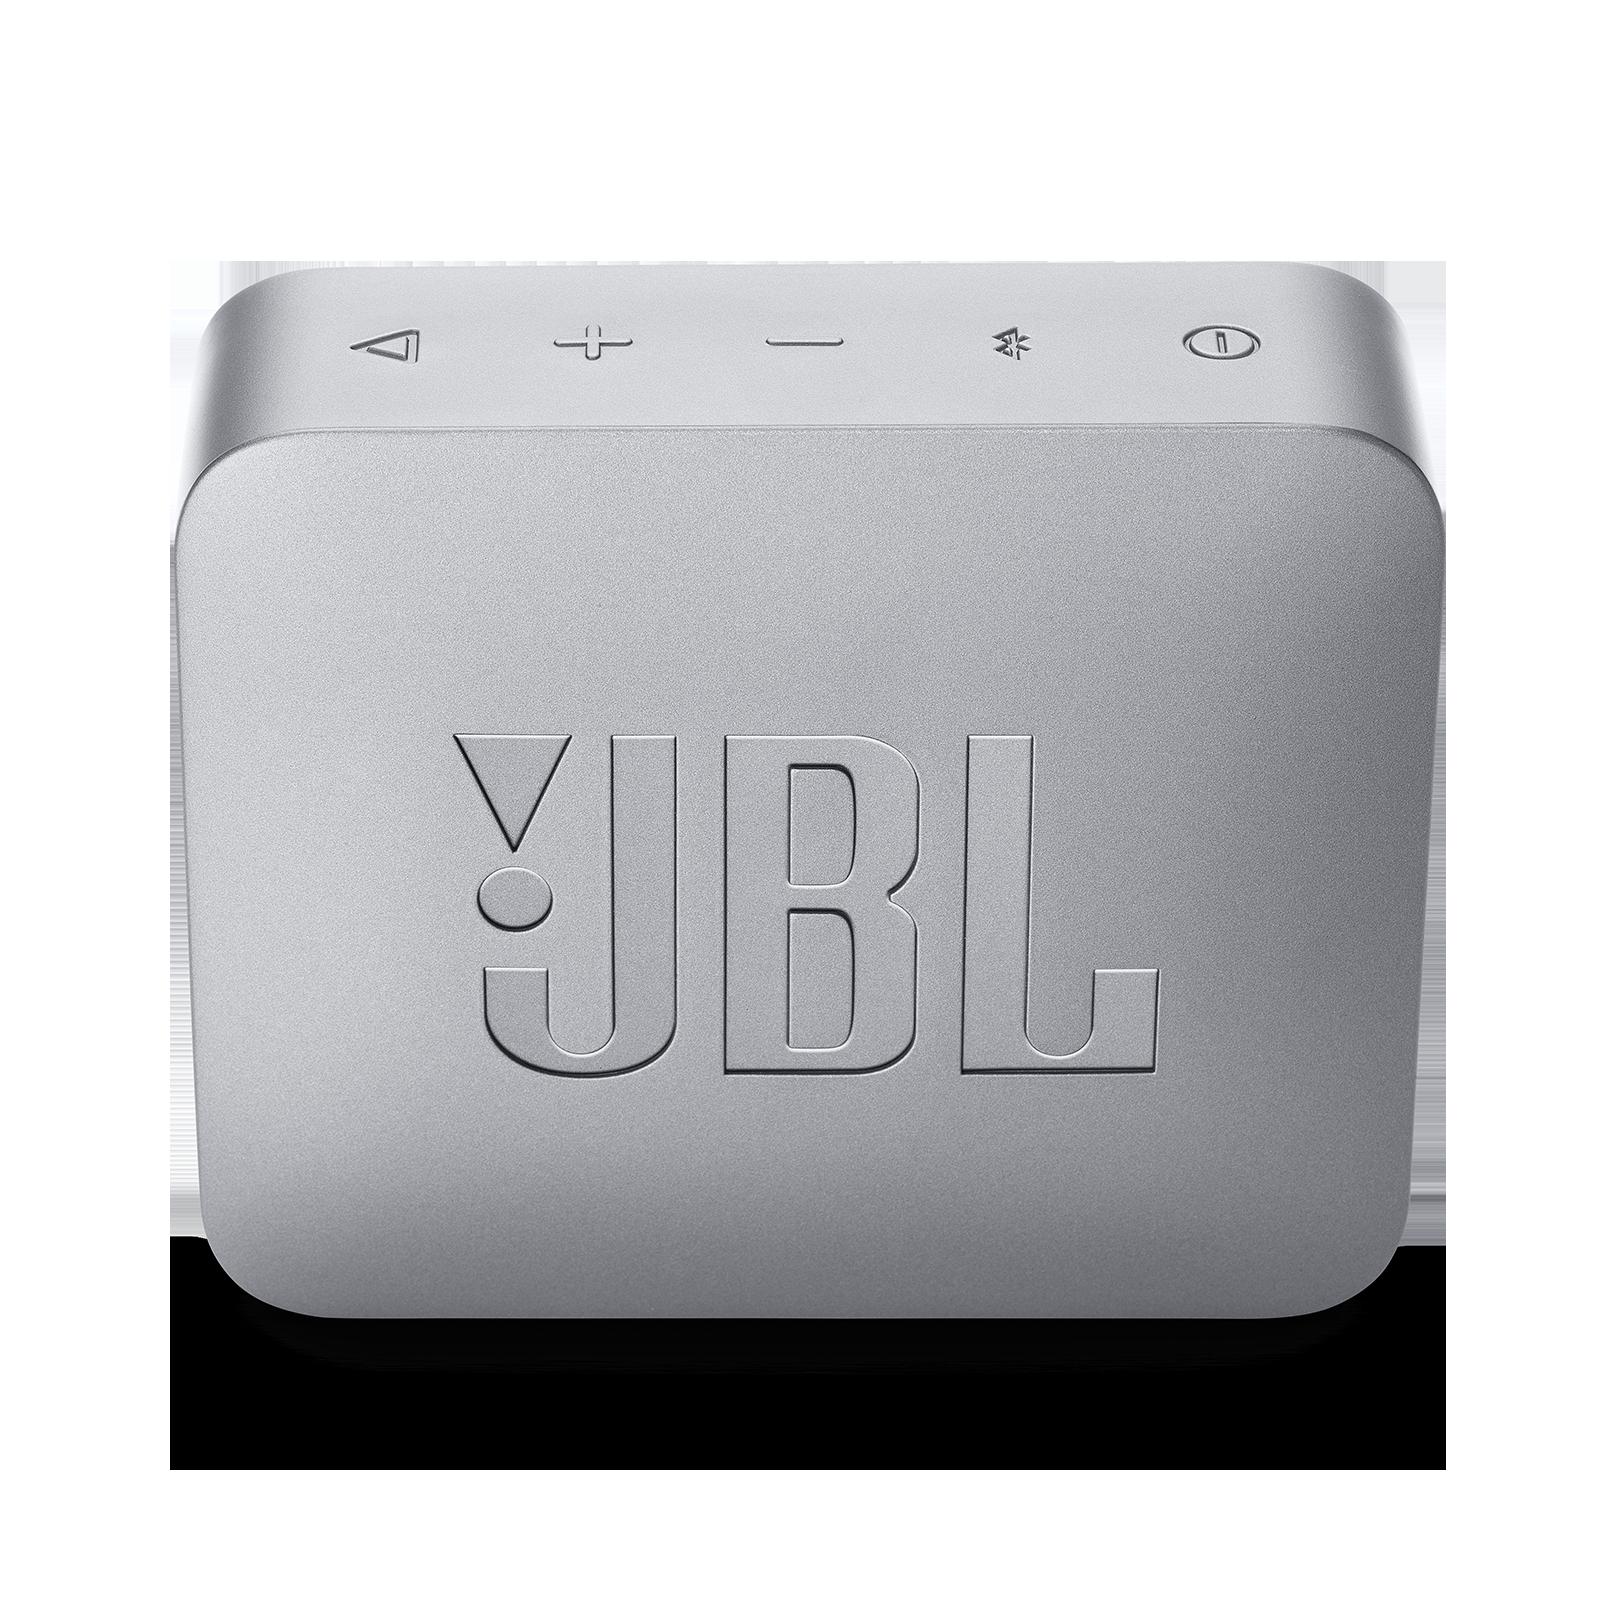 JBL GO 2 - Ash Gray - Portable Bluetooth speaker - Back